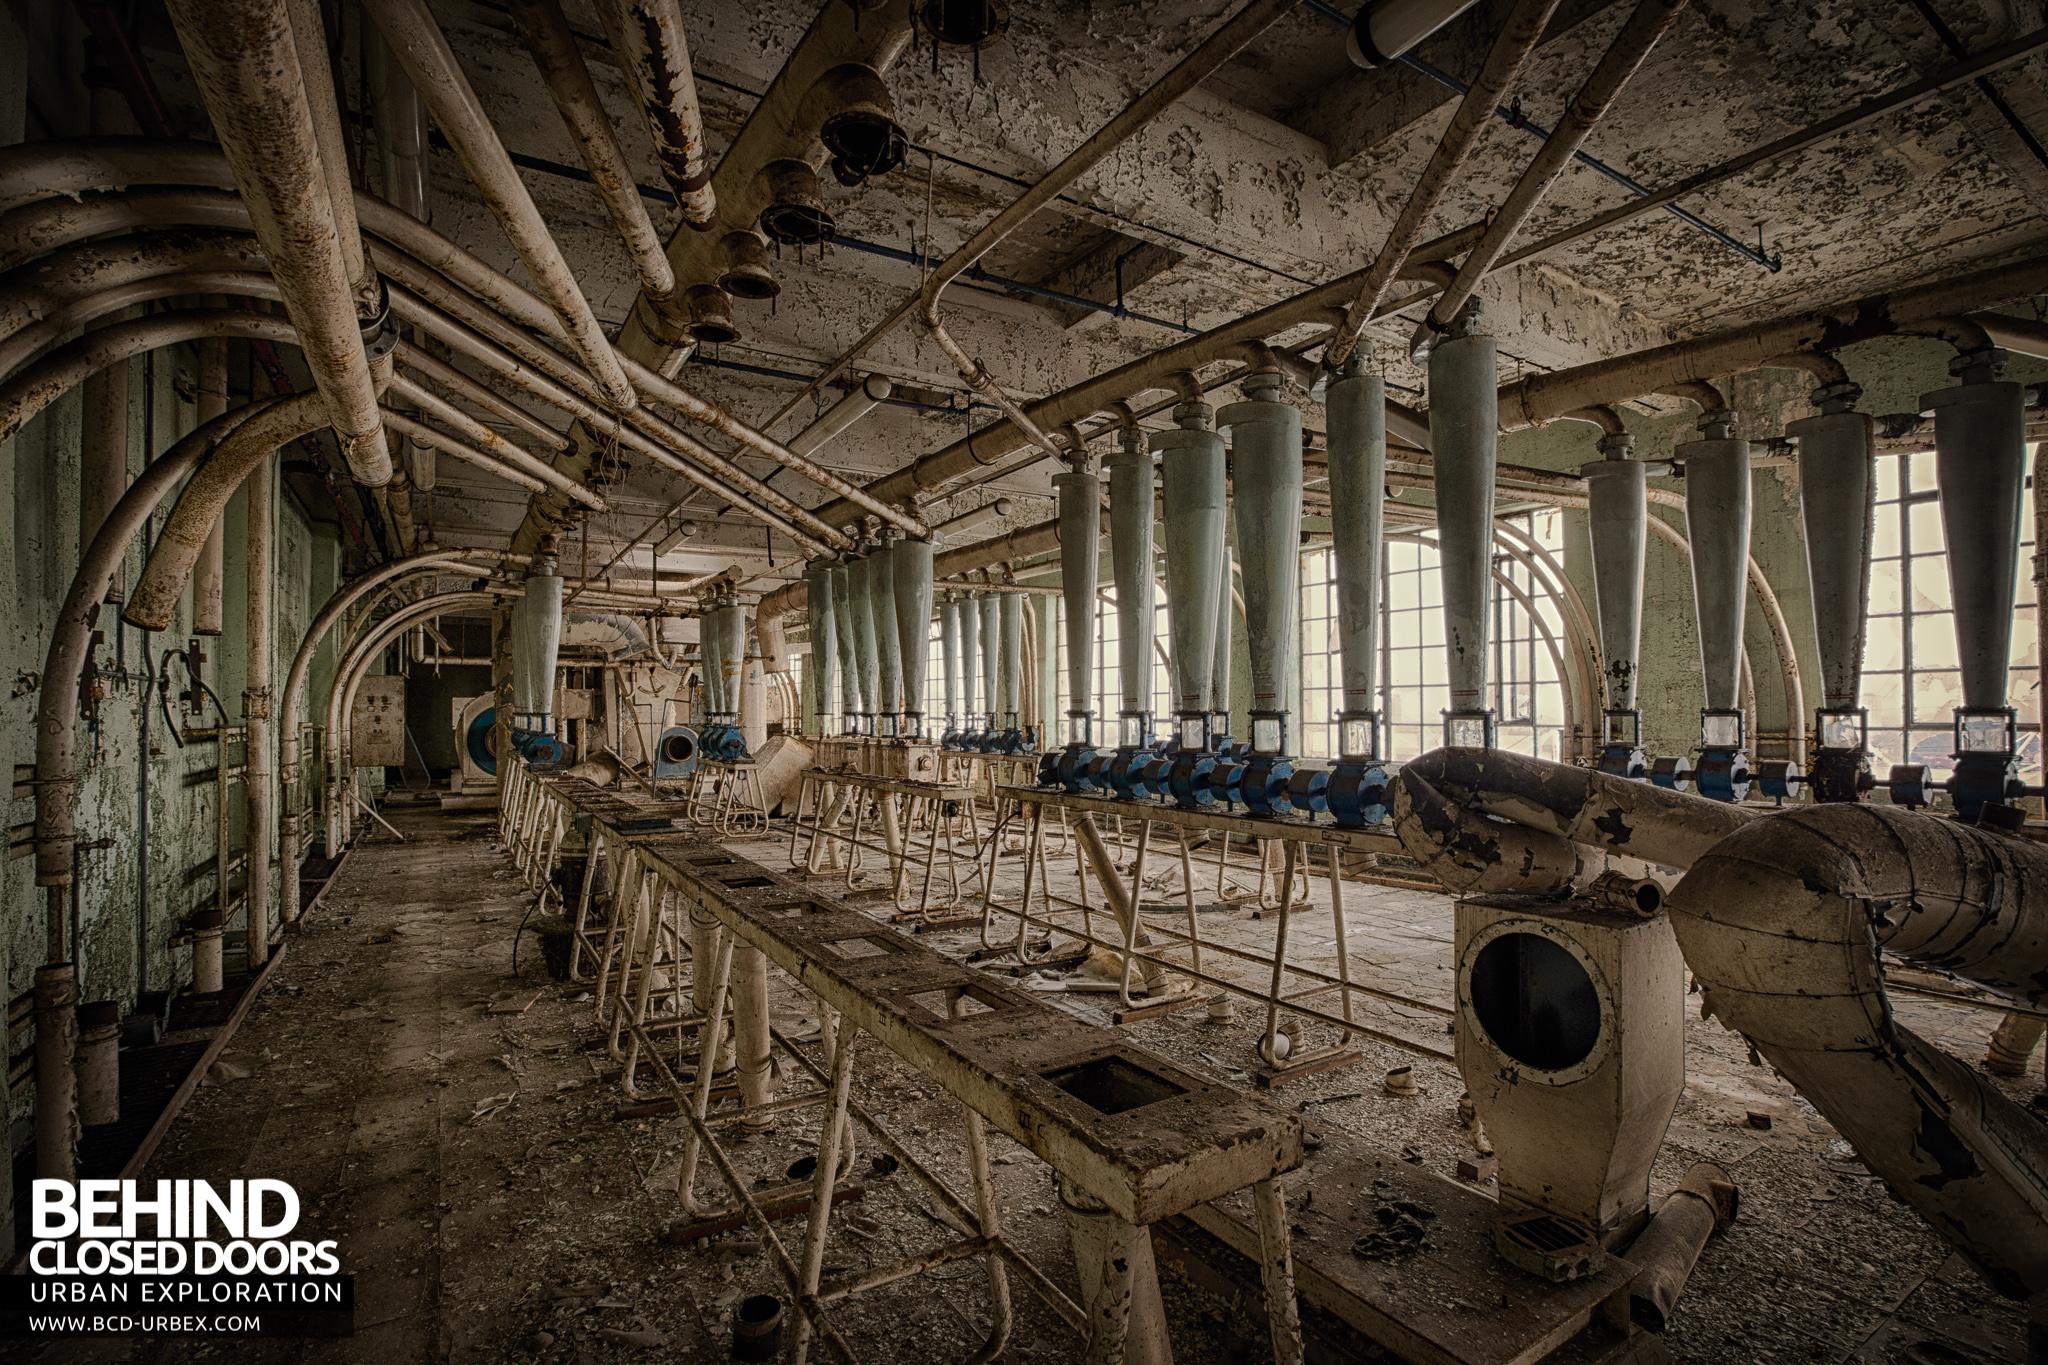 Spillers Millennium Mills London 187 Urbex Behind Closed